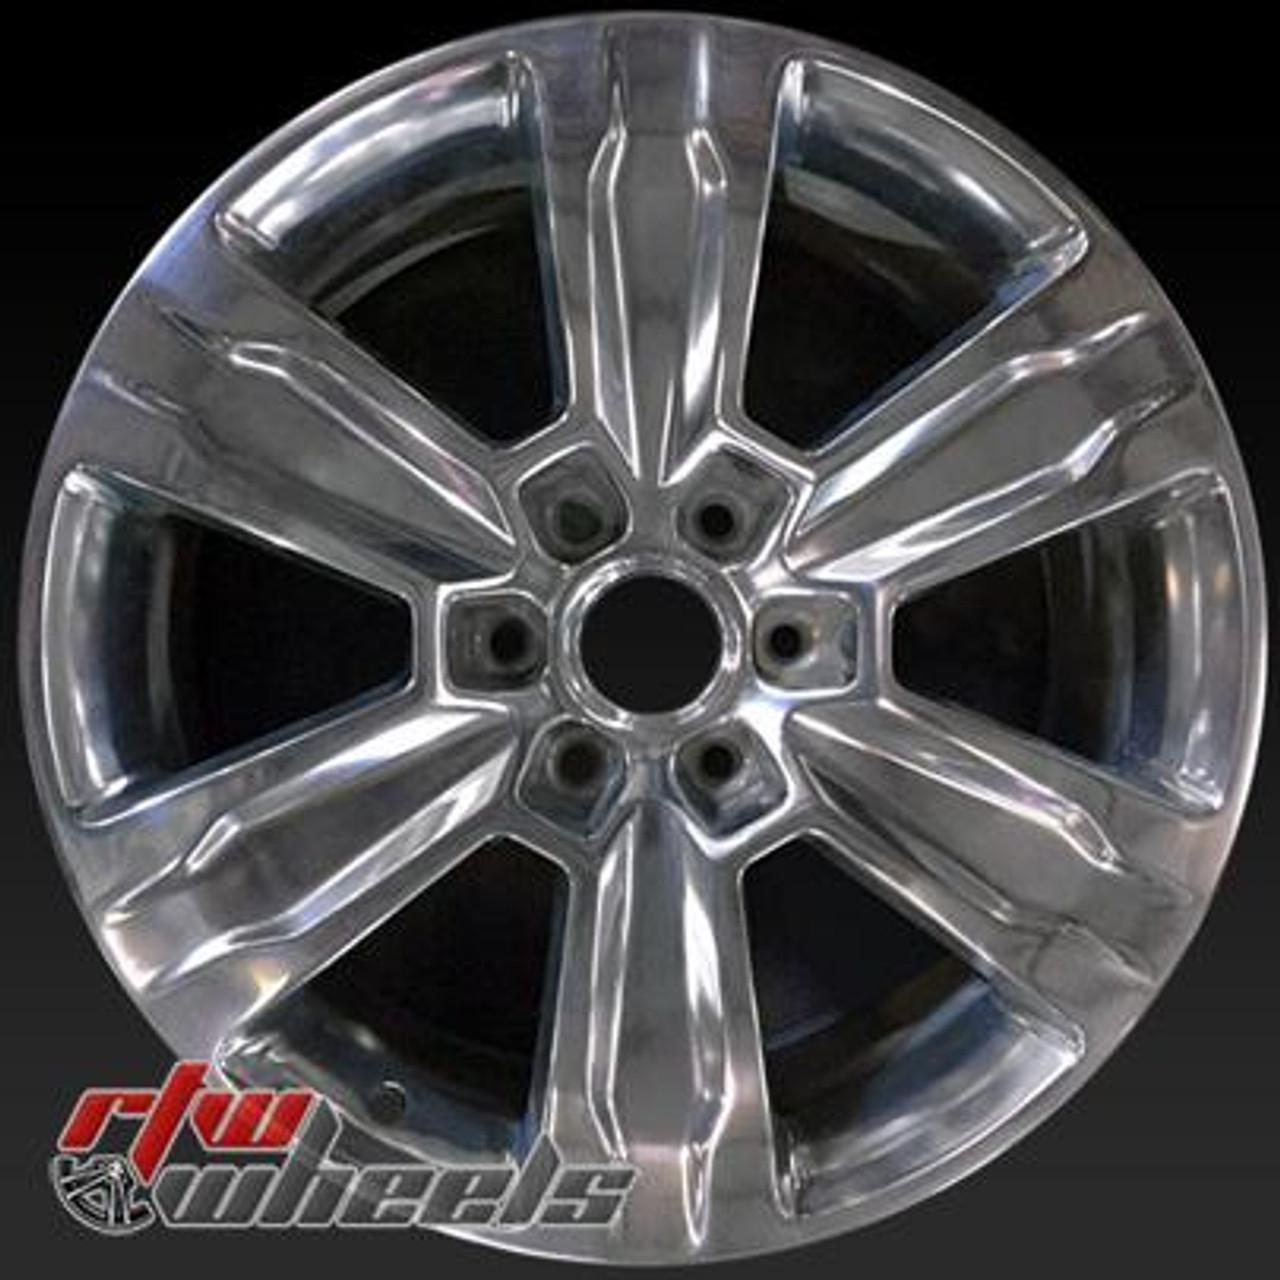 Ford F150 Rims >> 20 Ford F150 Oem Wheels 2015 2017 Polished Rims 10004